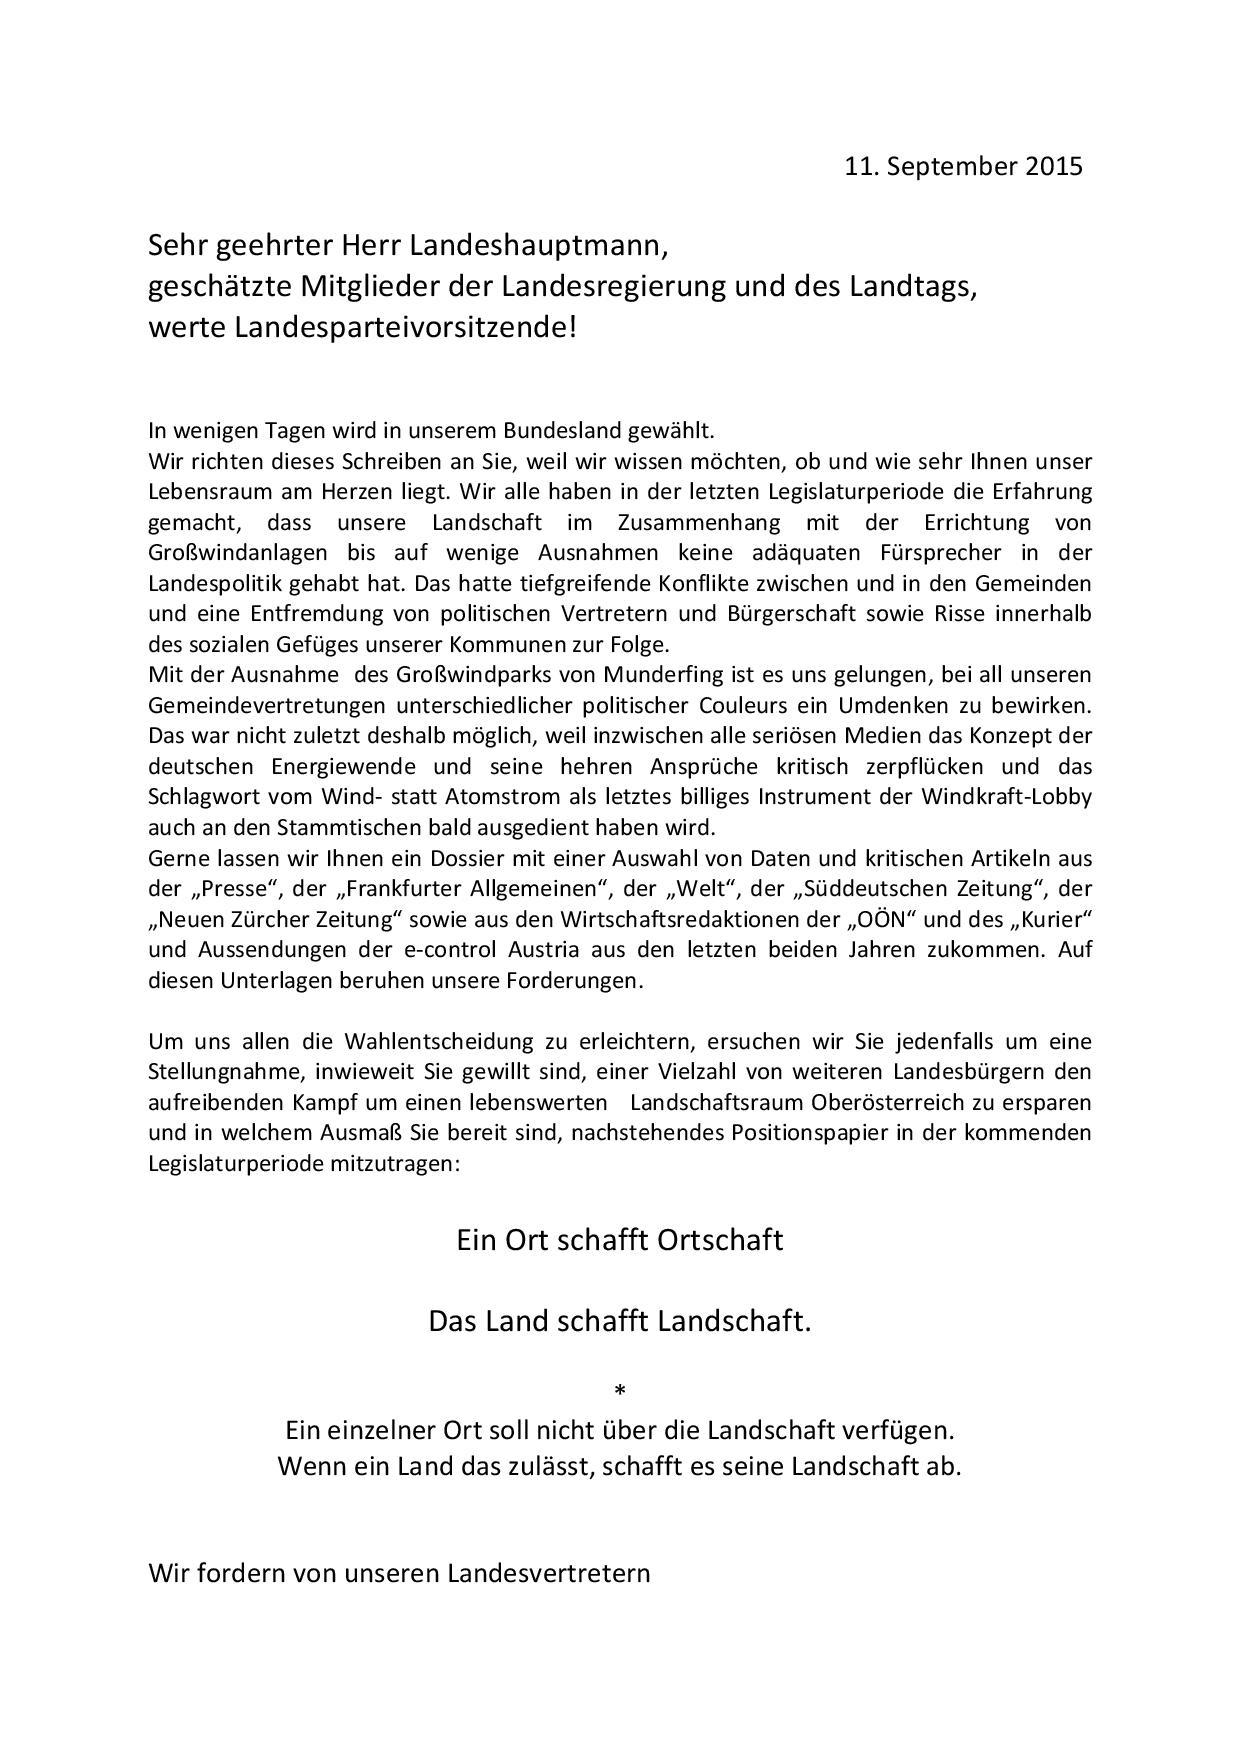 PositionspapierLandschaftsschutz (3)(Aschenberger)-page-001